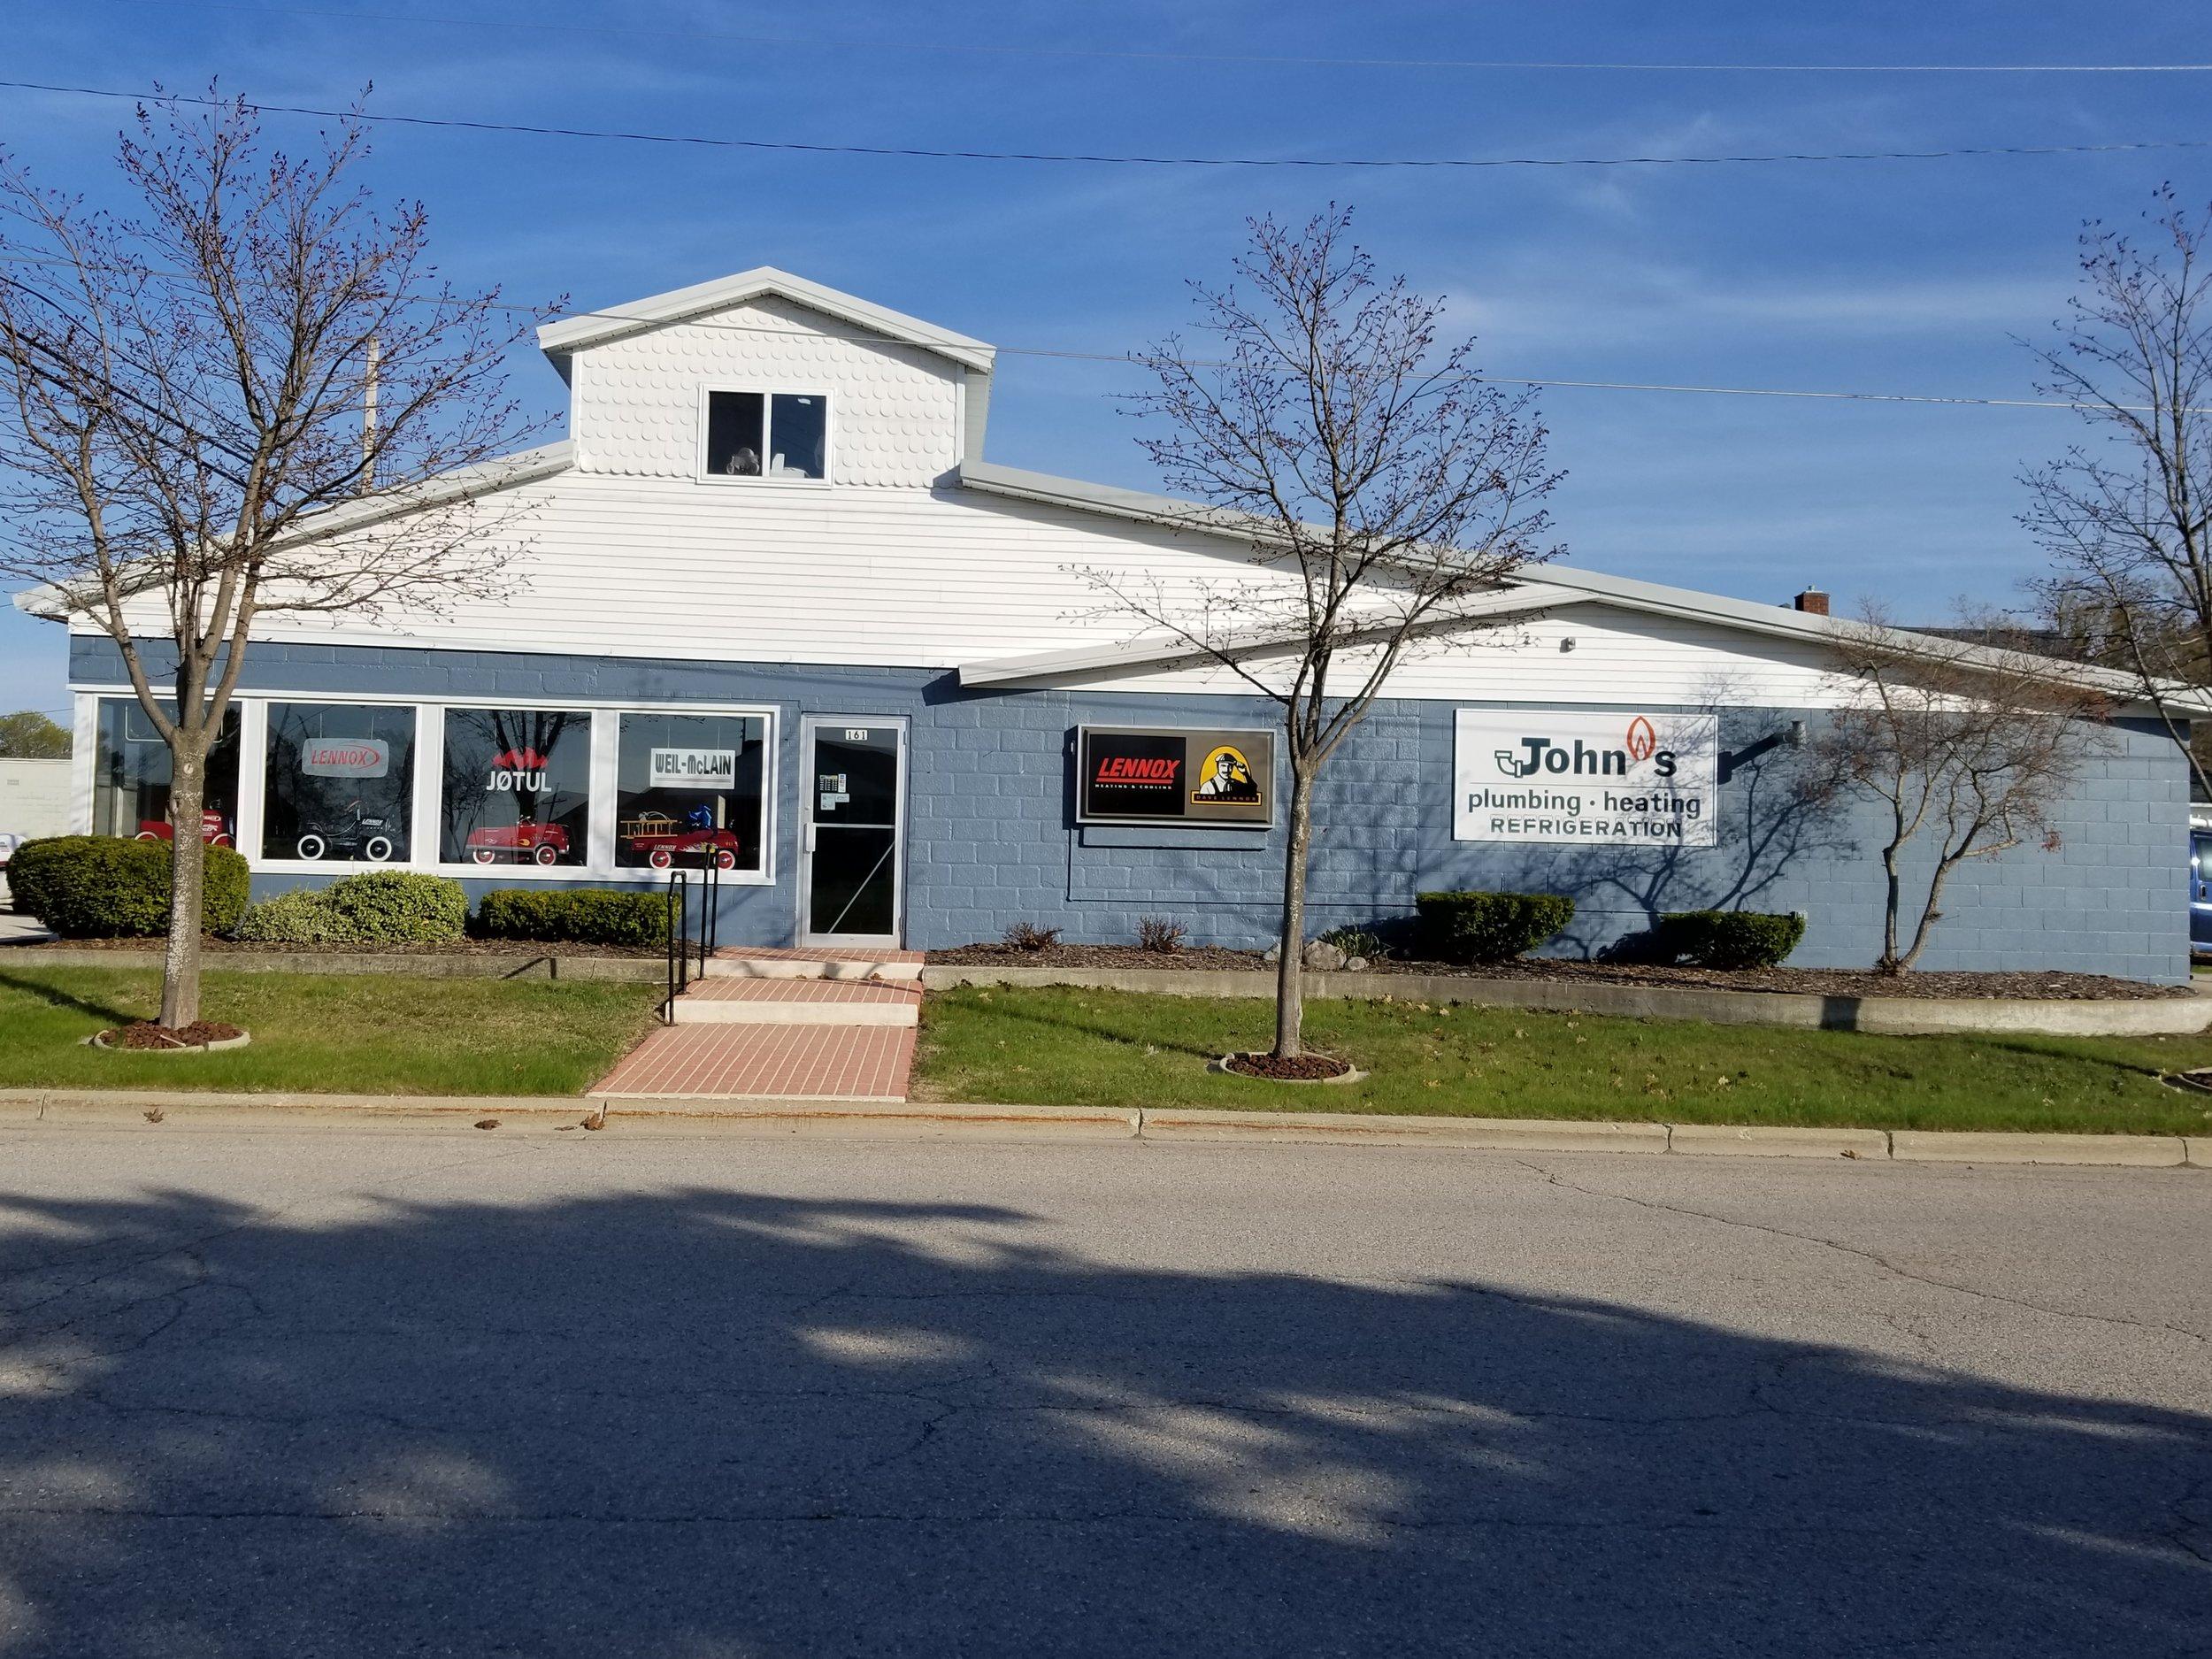 John's Plumbing & Heating, Inc. - 161 West Friedrich StreetRogers City, MI 49779(989) 734-4971